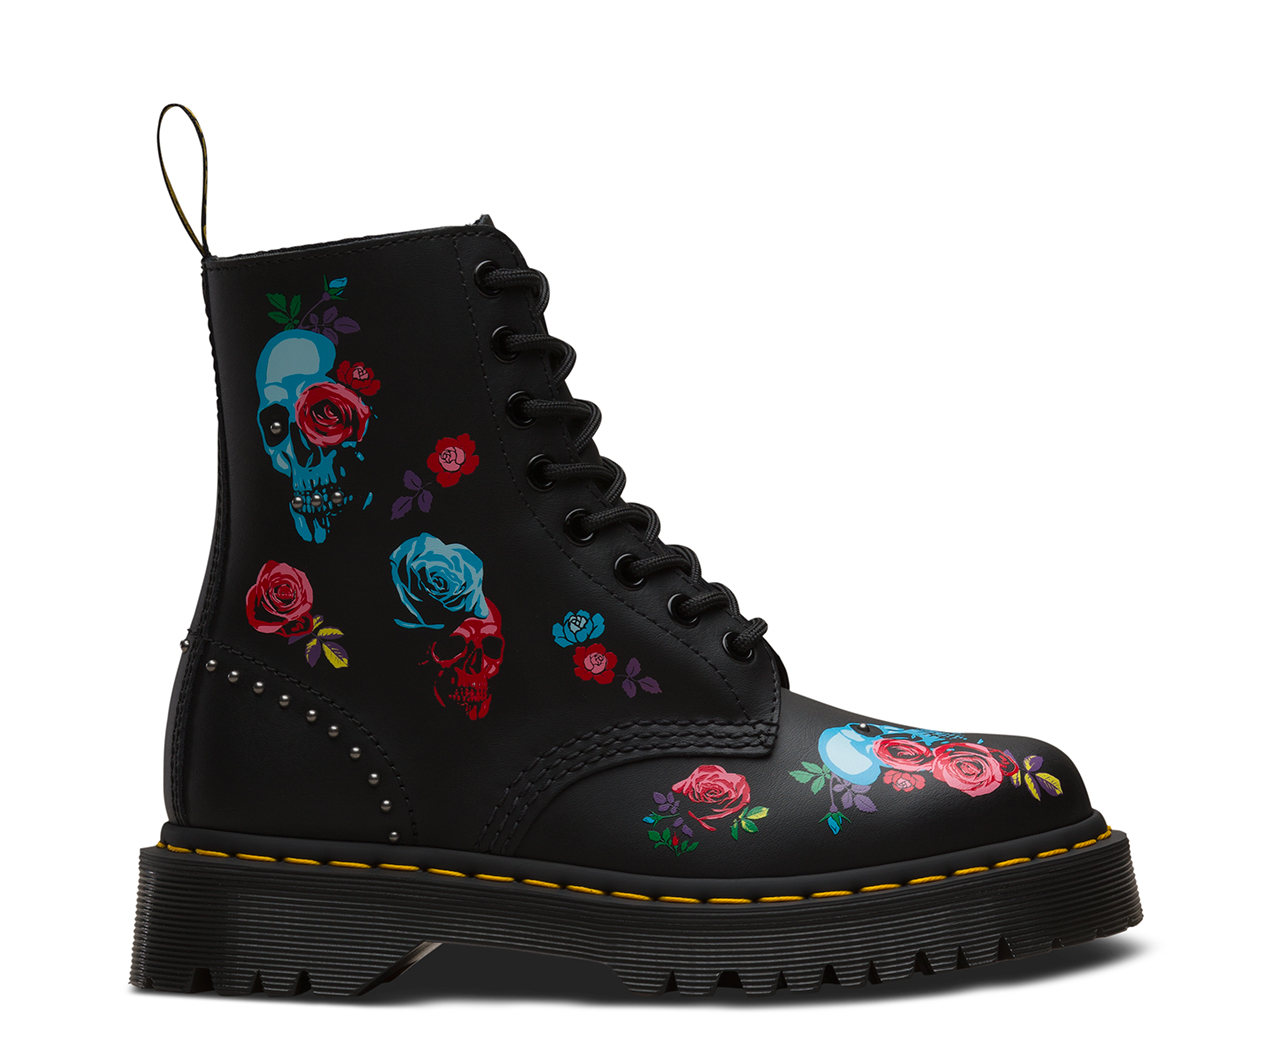 1460 Pascal Rose Bex Boots Dr Martens Official Site